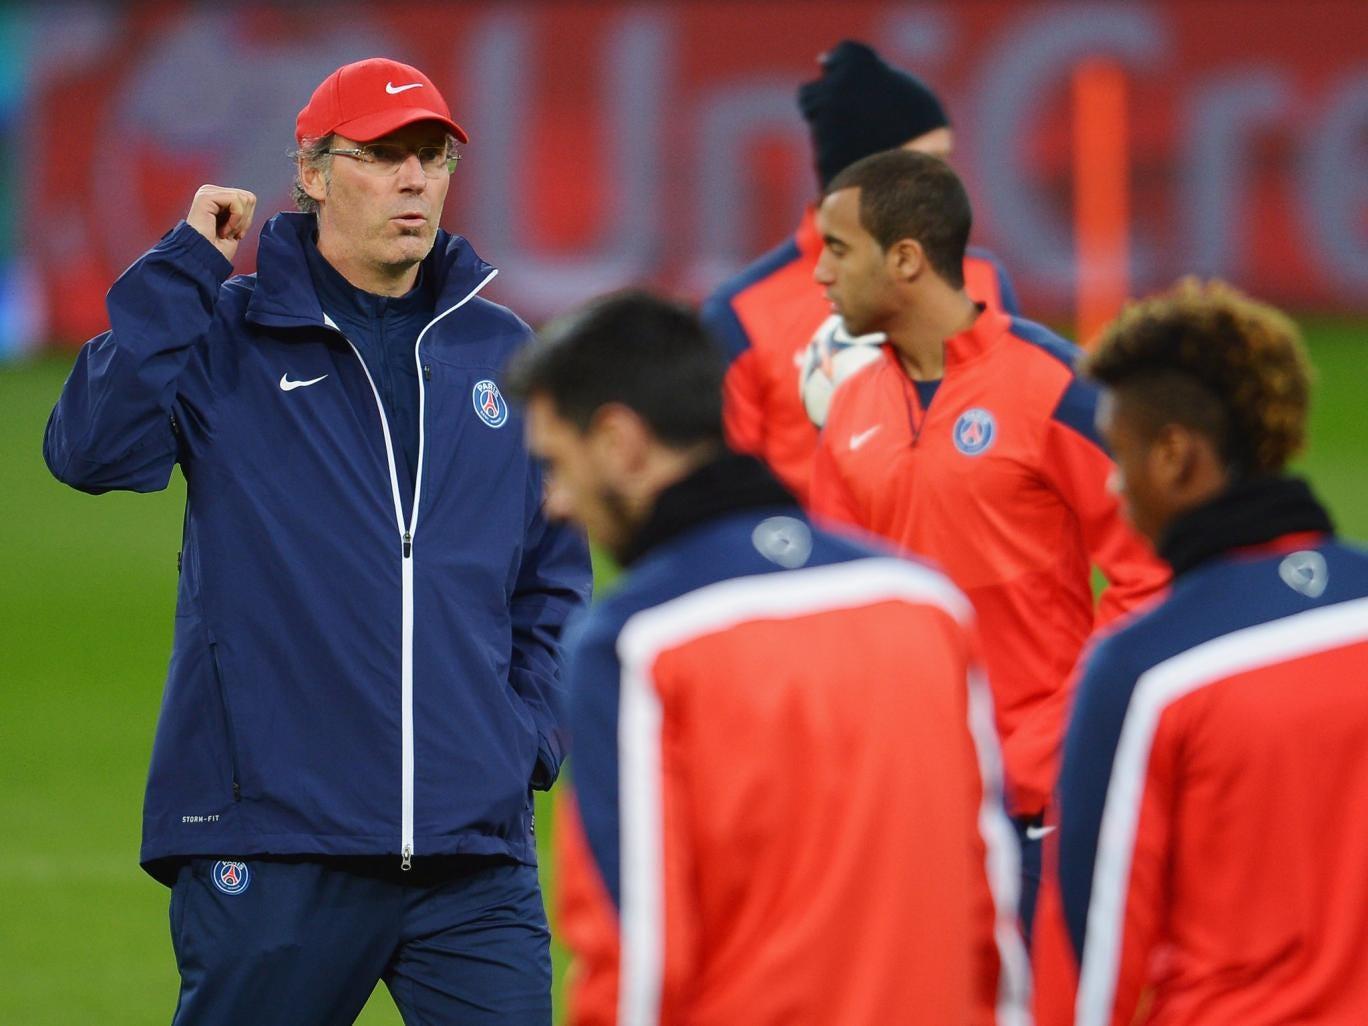 PSG manager Laurent Blanc